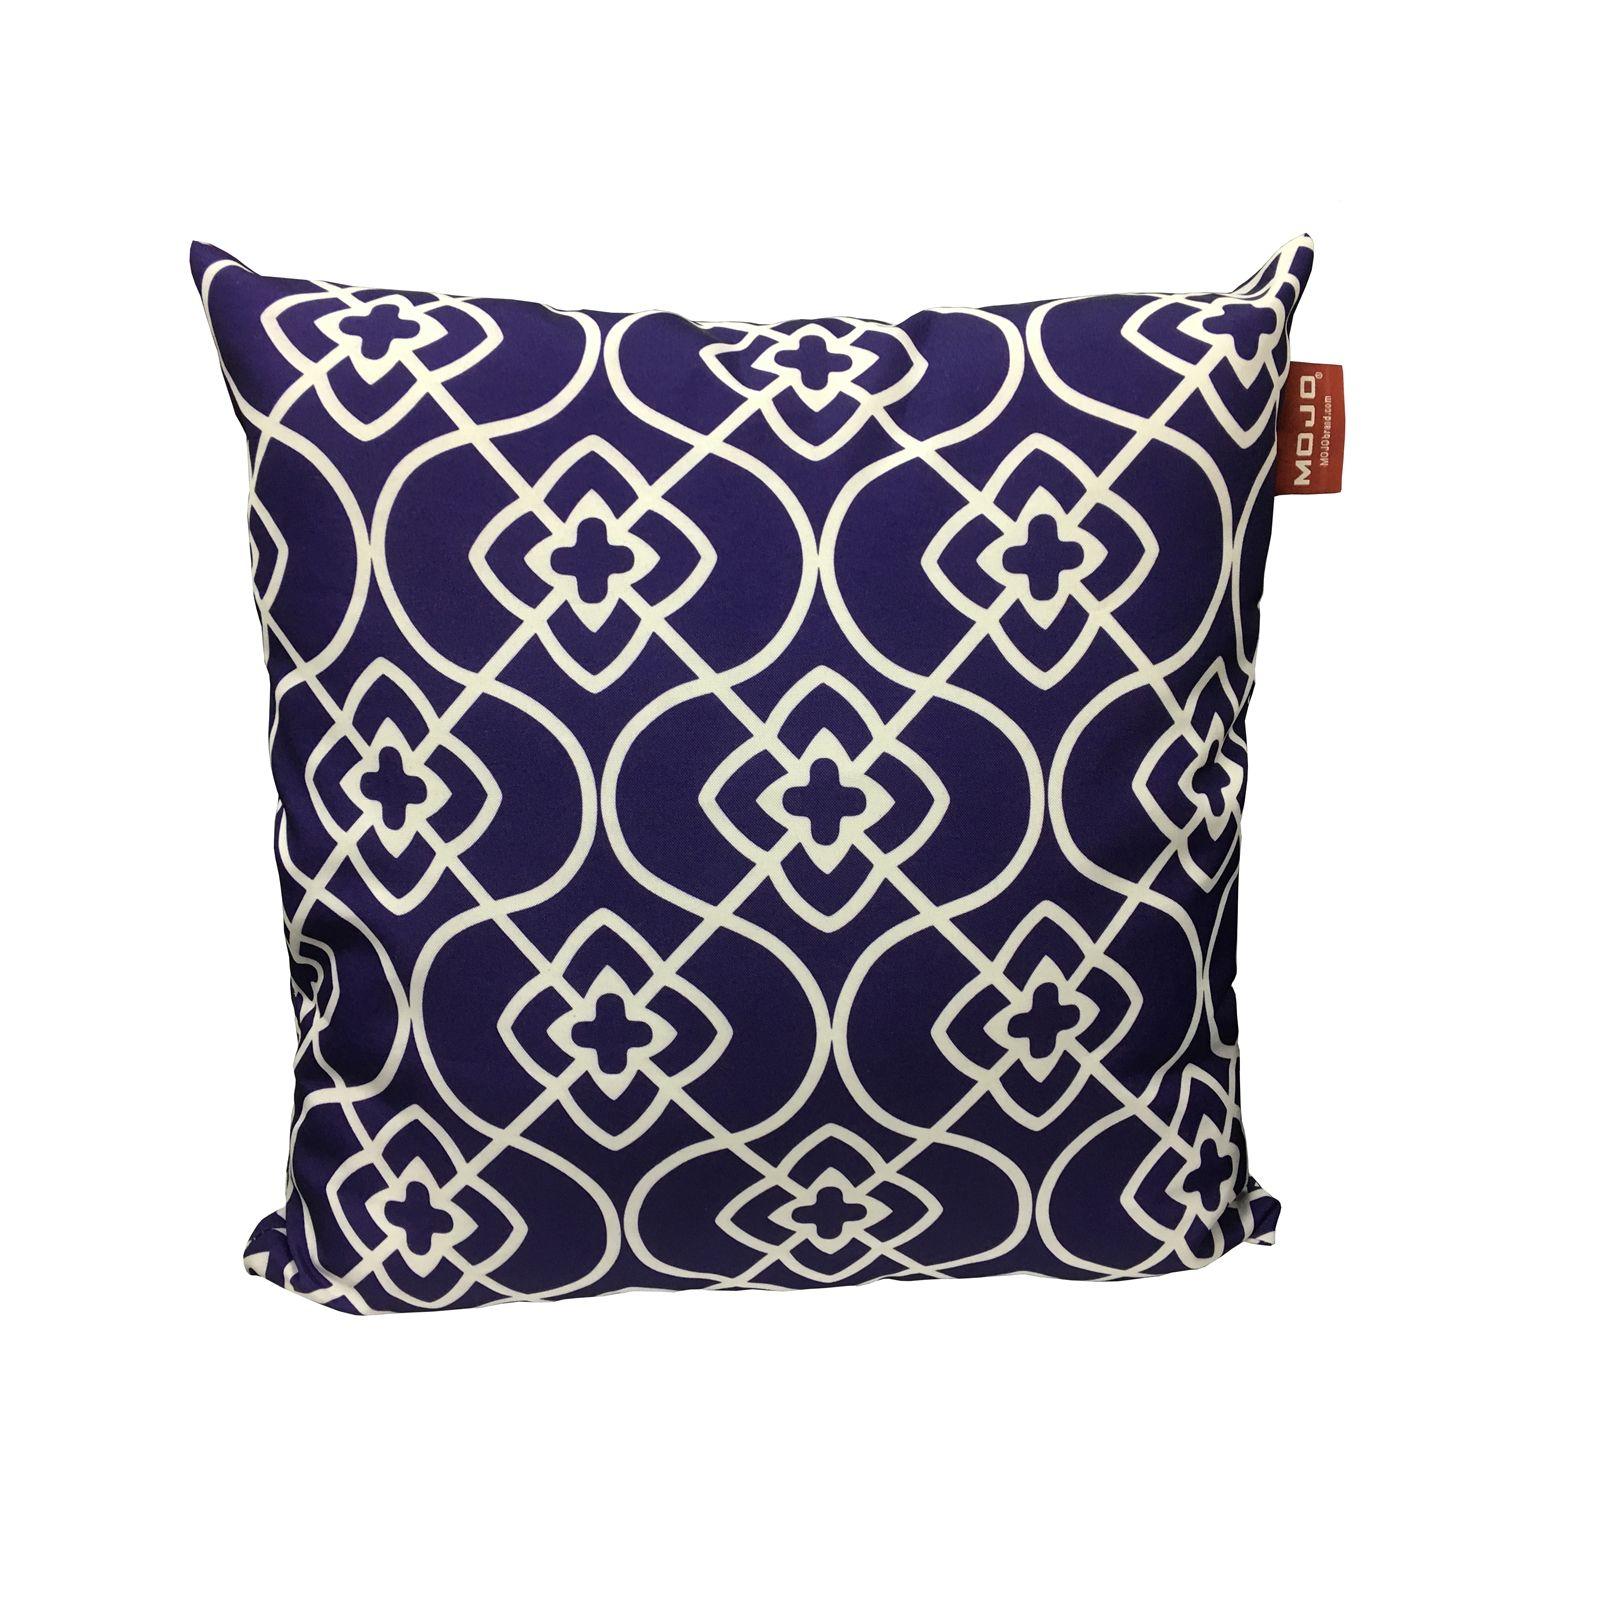 Mojo 45cm Provincial Outdoor Cushion Cover Outdoor